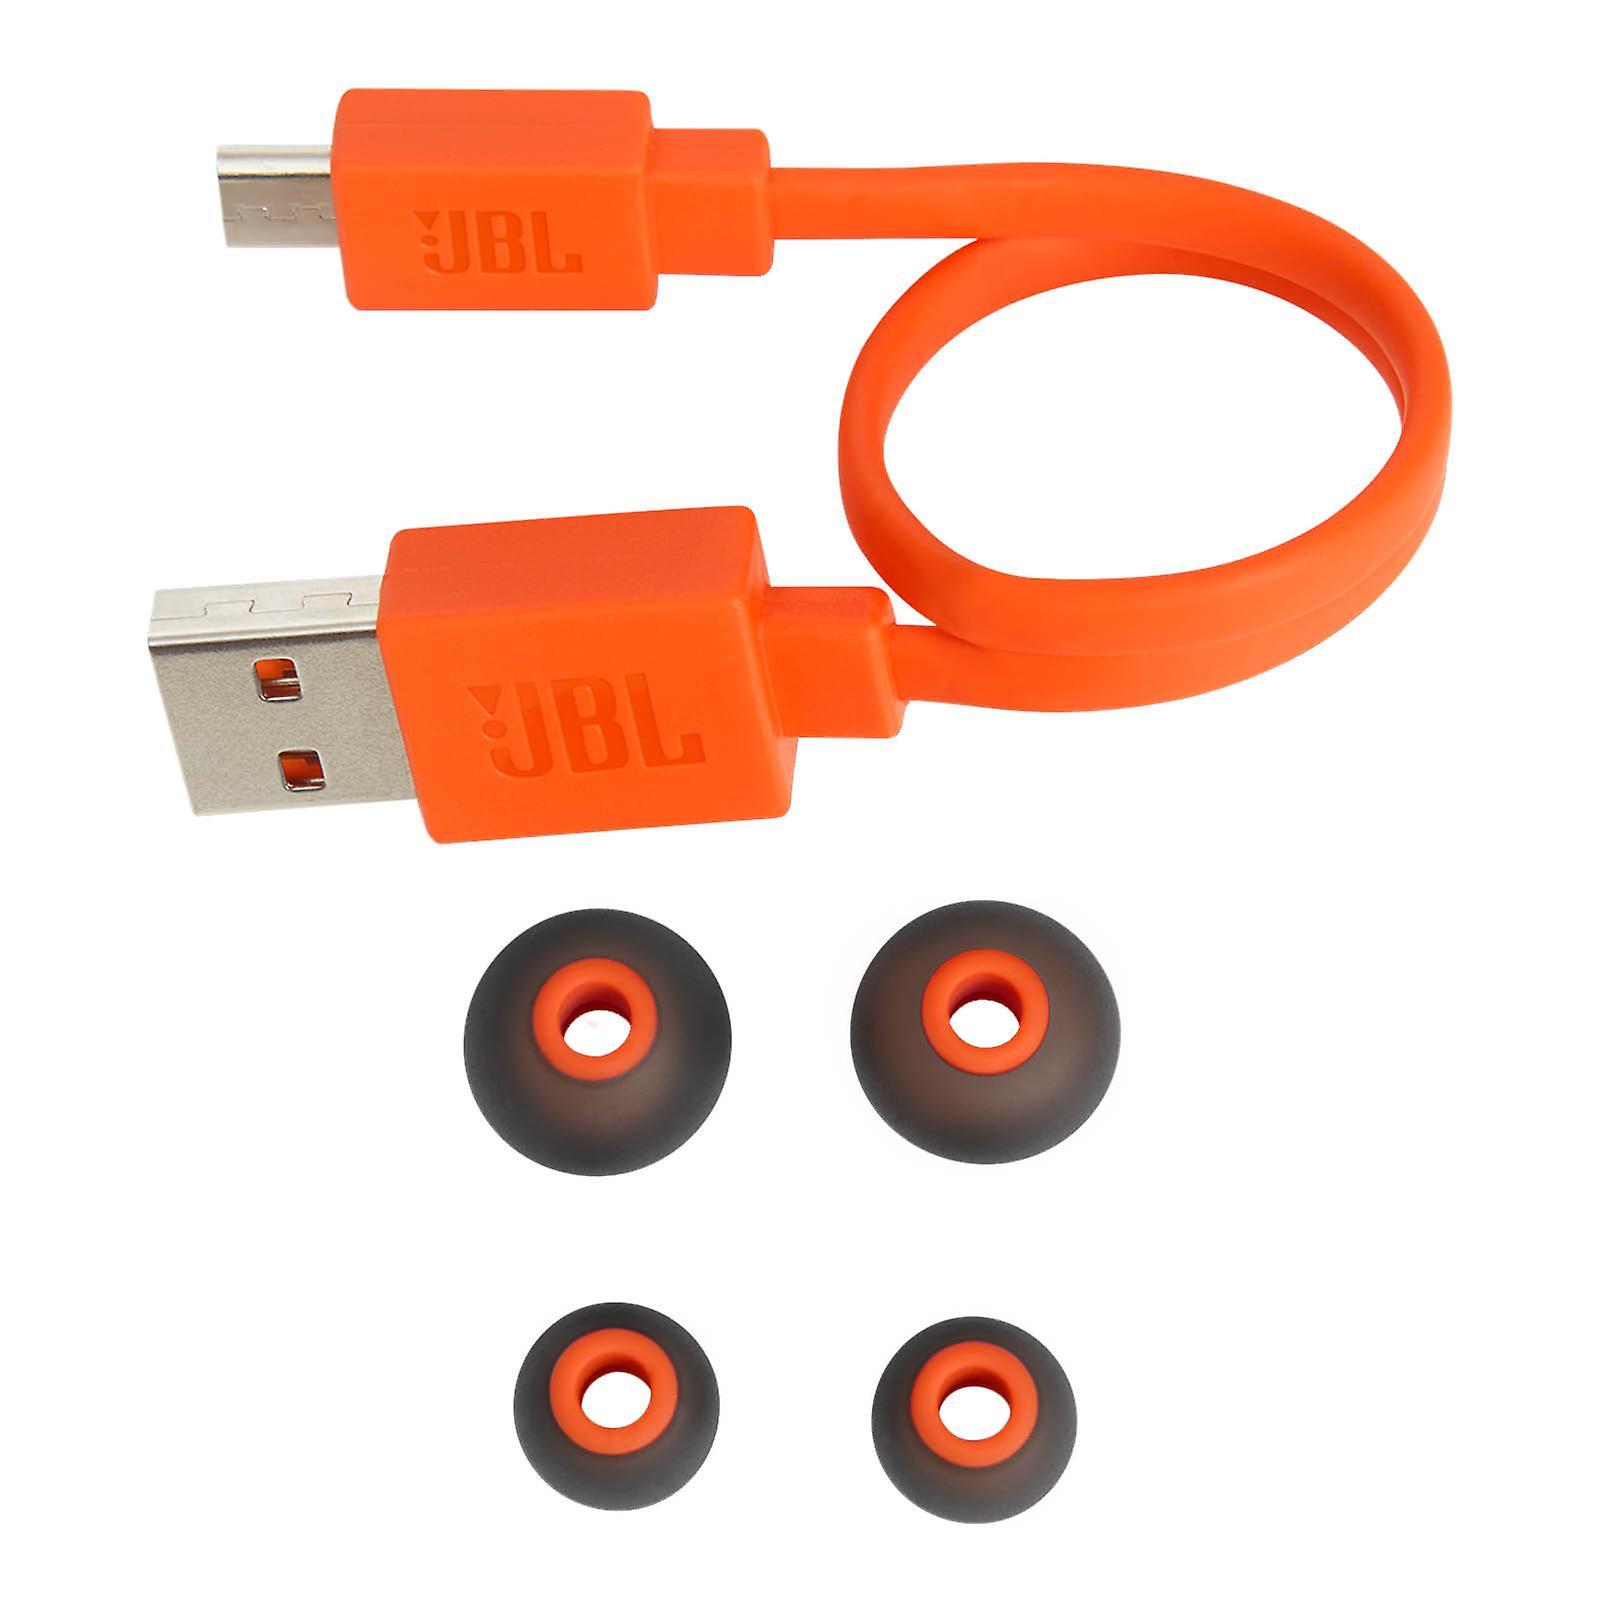 JBL T110BT Magnetic Remote Control + Microphone Bluetooth Earphones - Black